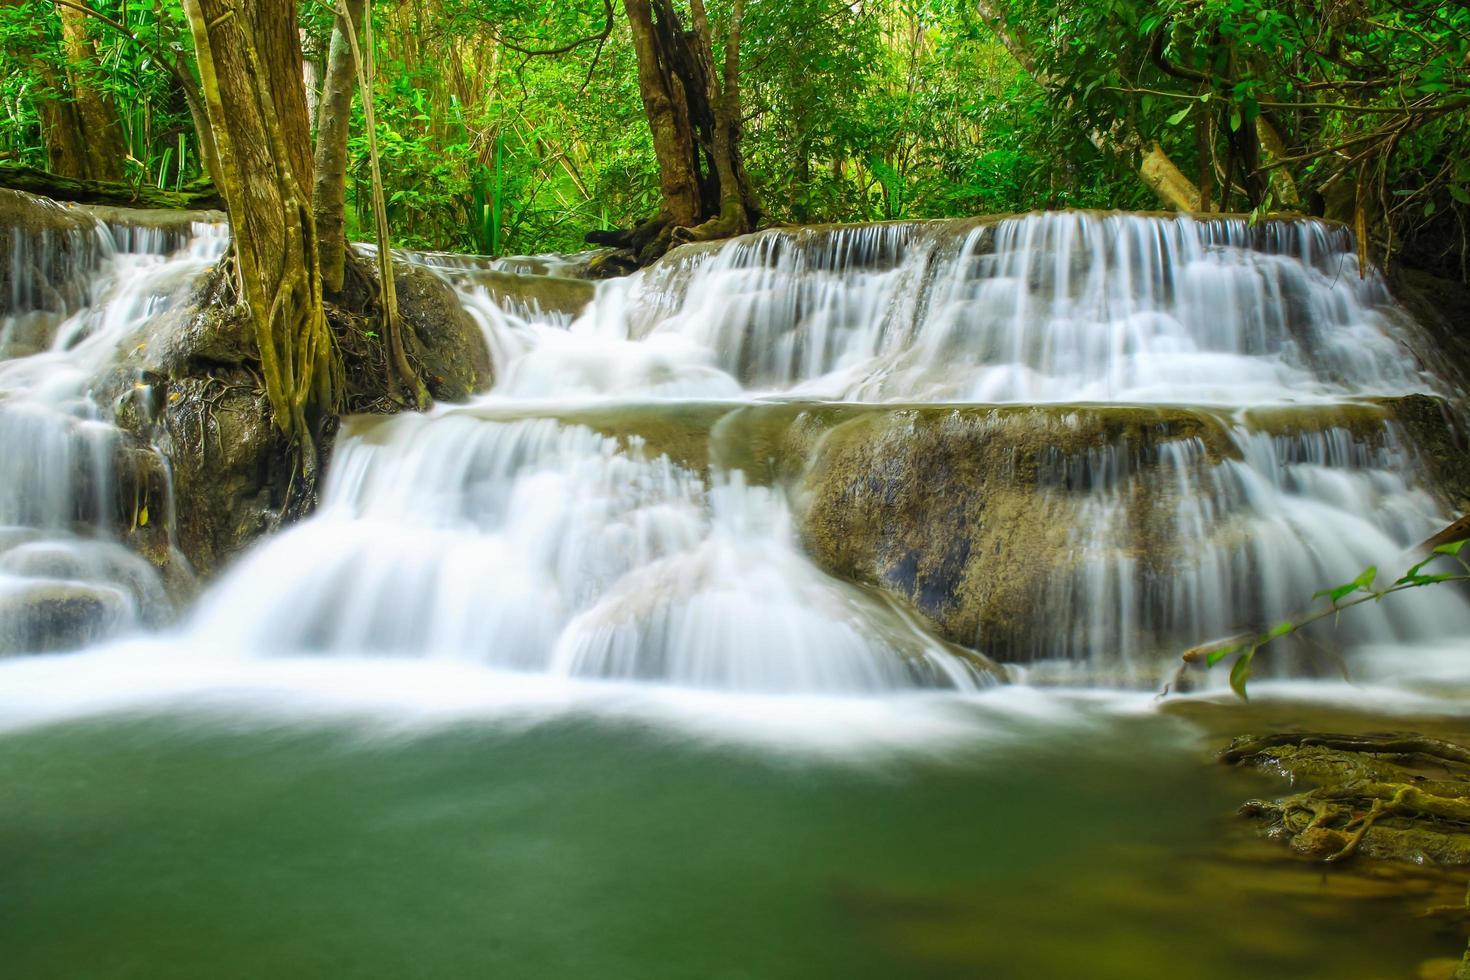 Huai Mae Khamin Wasserfall in einem Wald foto